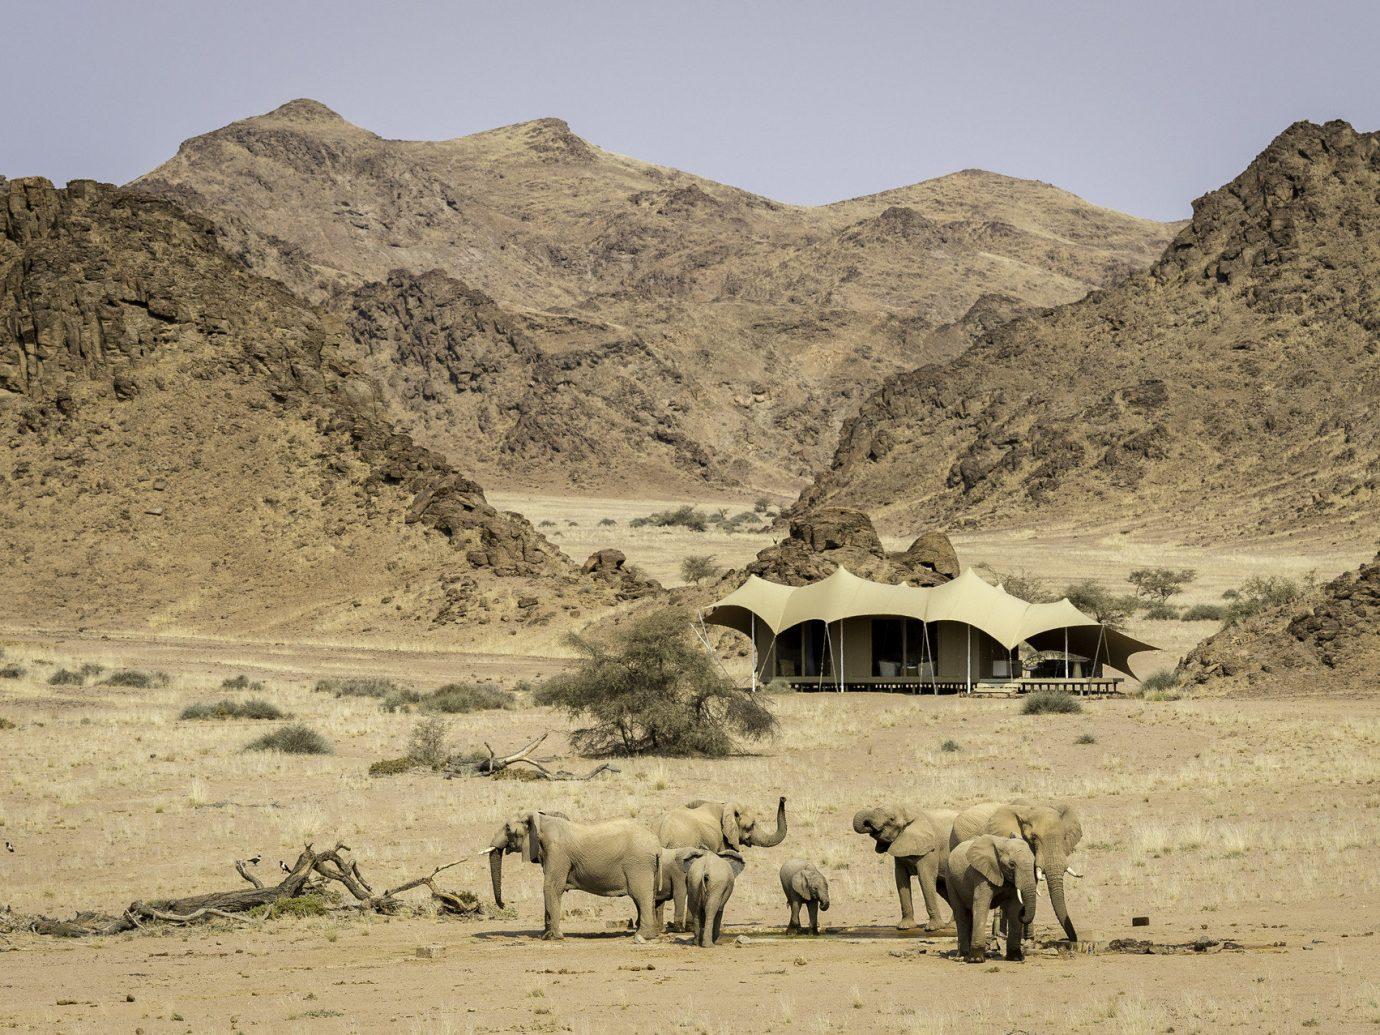 Spring Trips Trip Ideas outdoor mountain sky natural environment wilderness animal mammal wadi steppe Desert herd landscape aeolian landform plateau valley sand Camel Adventure sahara Safari dirt